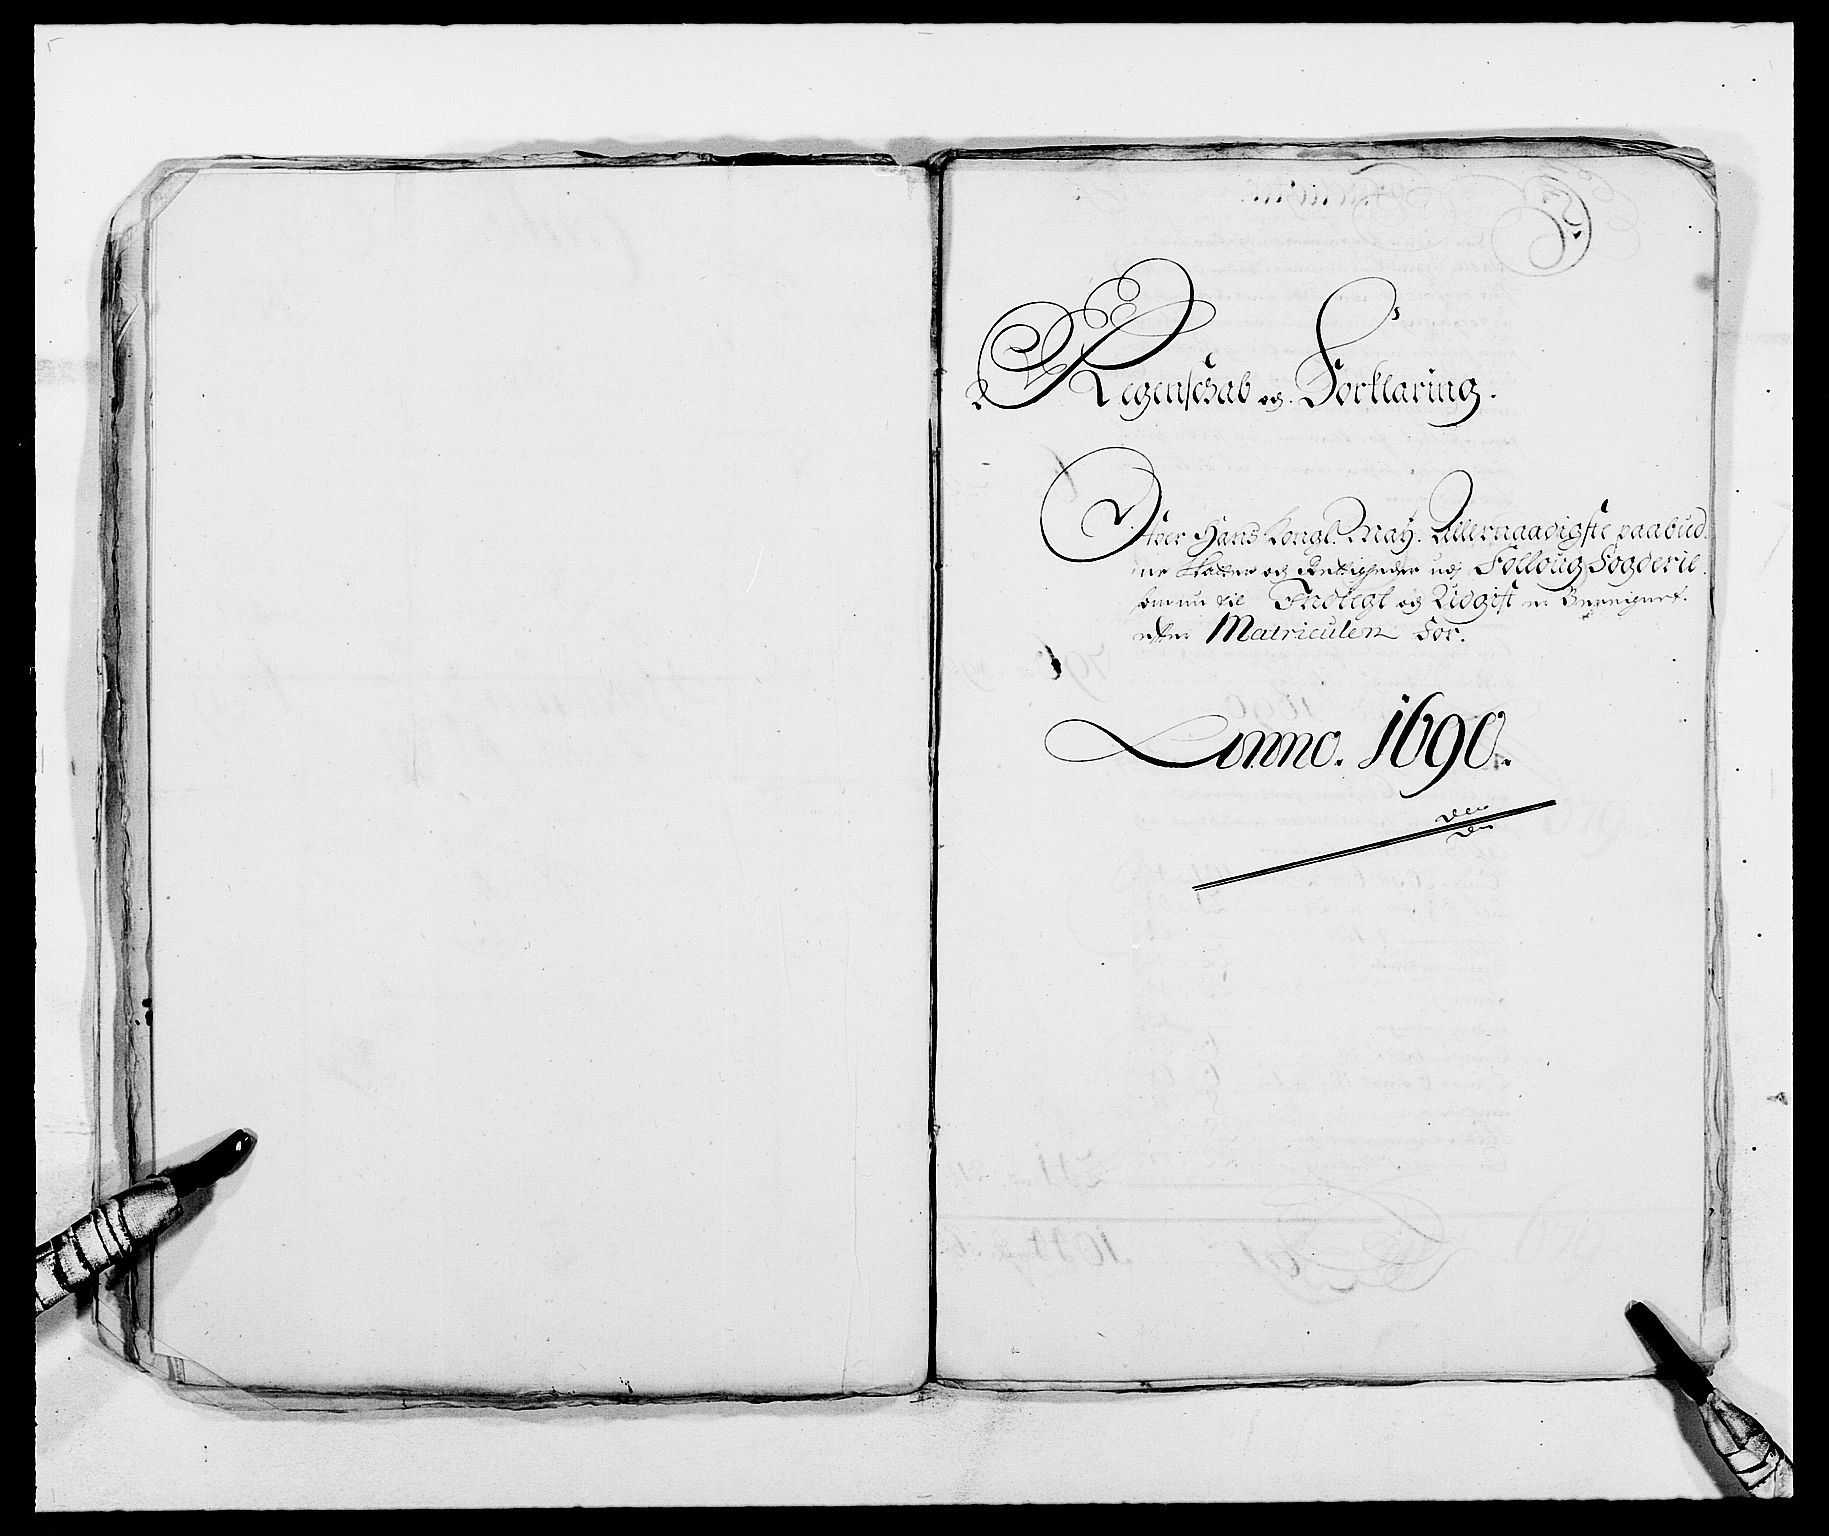 RA, Rentekammeret inntil 1814, Reviderte regnskaper, Fogderegnskap, R09/L0436: Fogderegnskap Follo, 1685-1691, s. 31